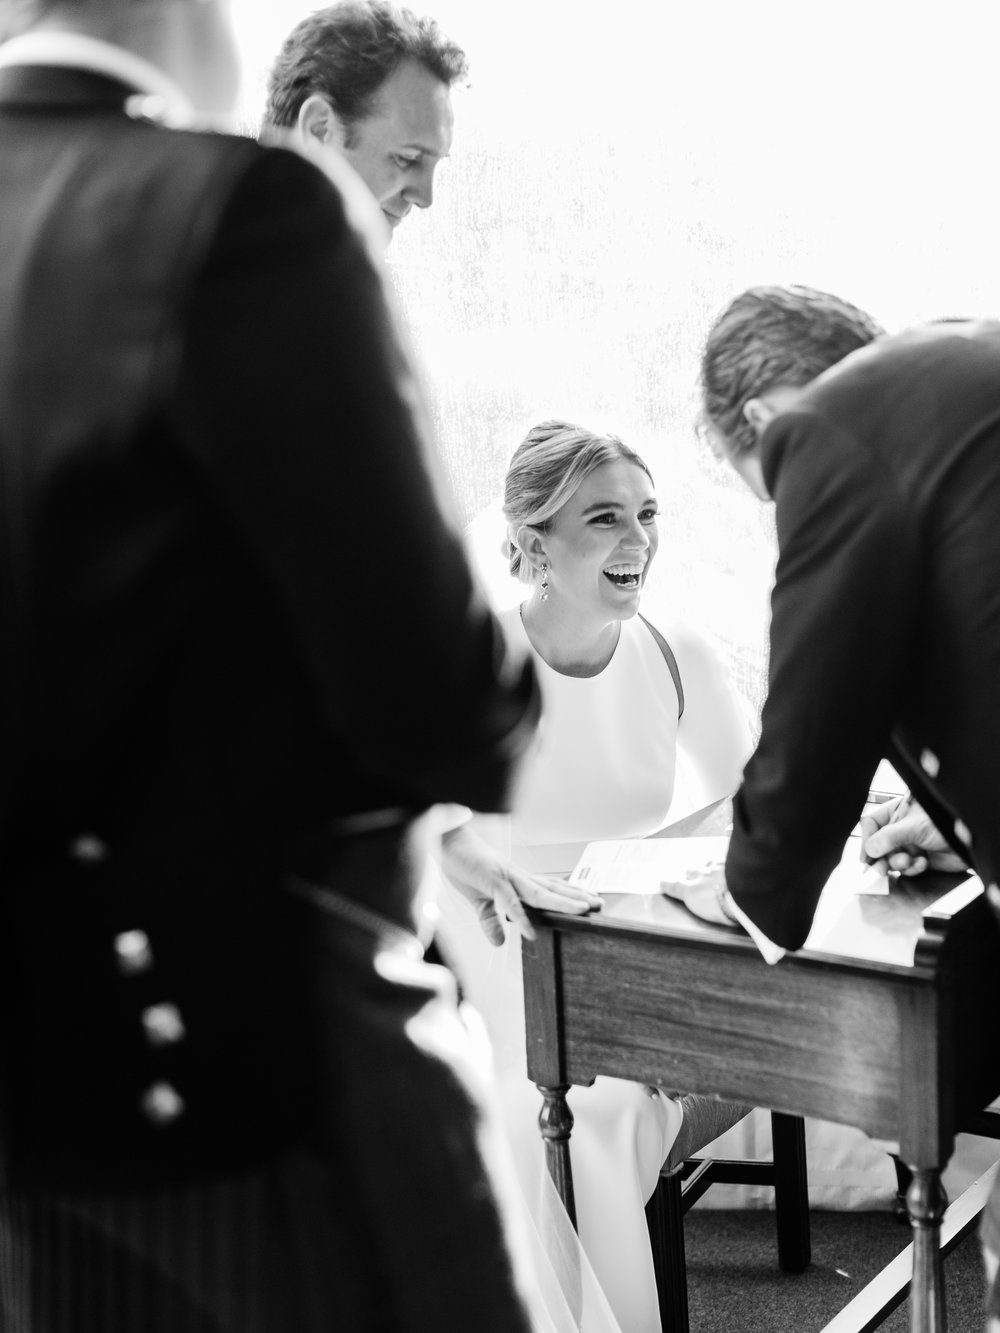 0506-Geneva-Ian-Wedding-Toronto Golf Club-When He Found Her-TorontoPhotographer.jpg